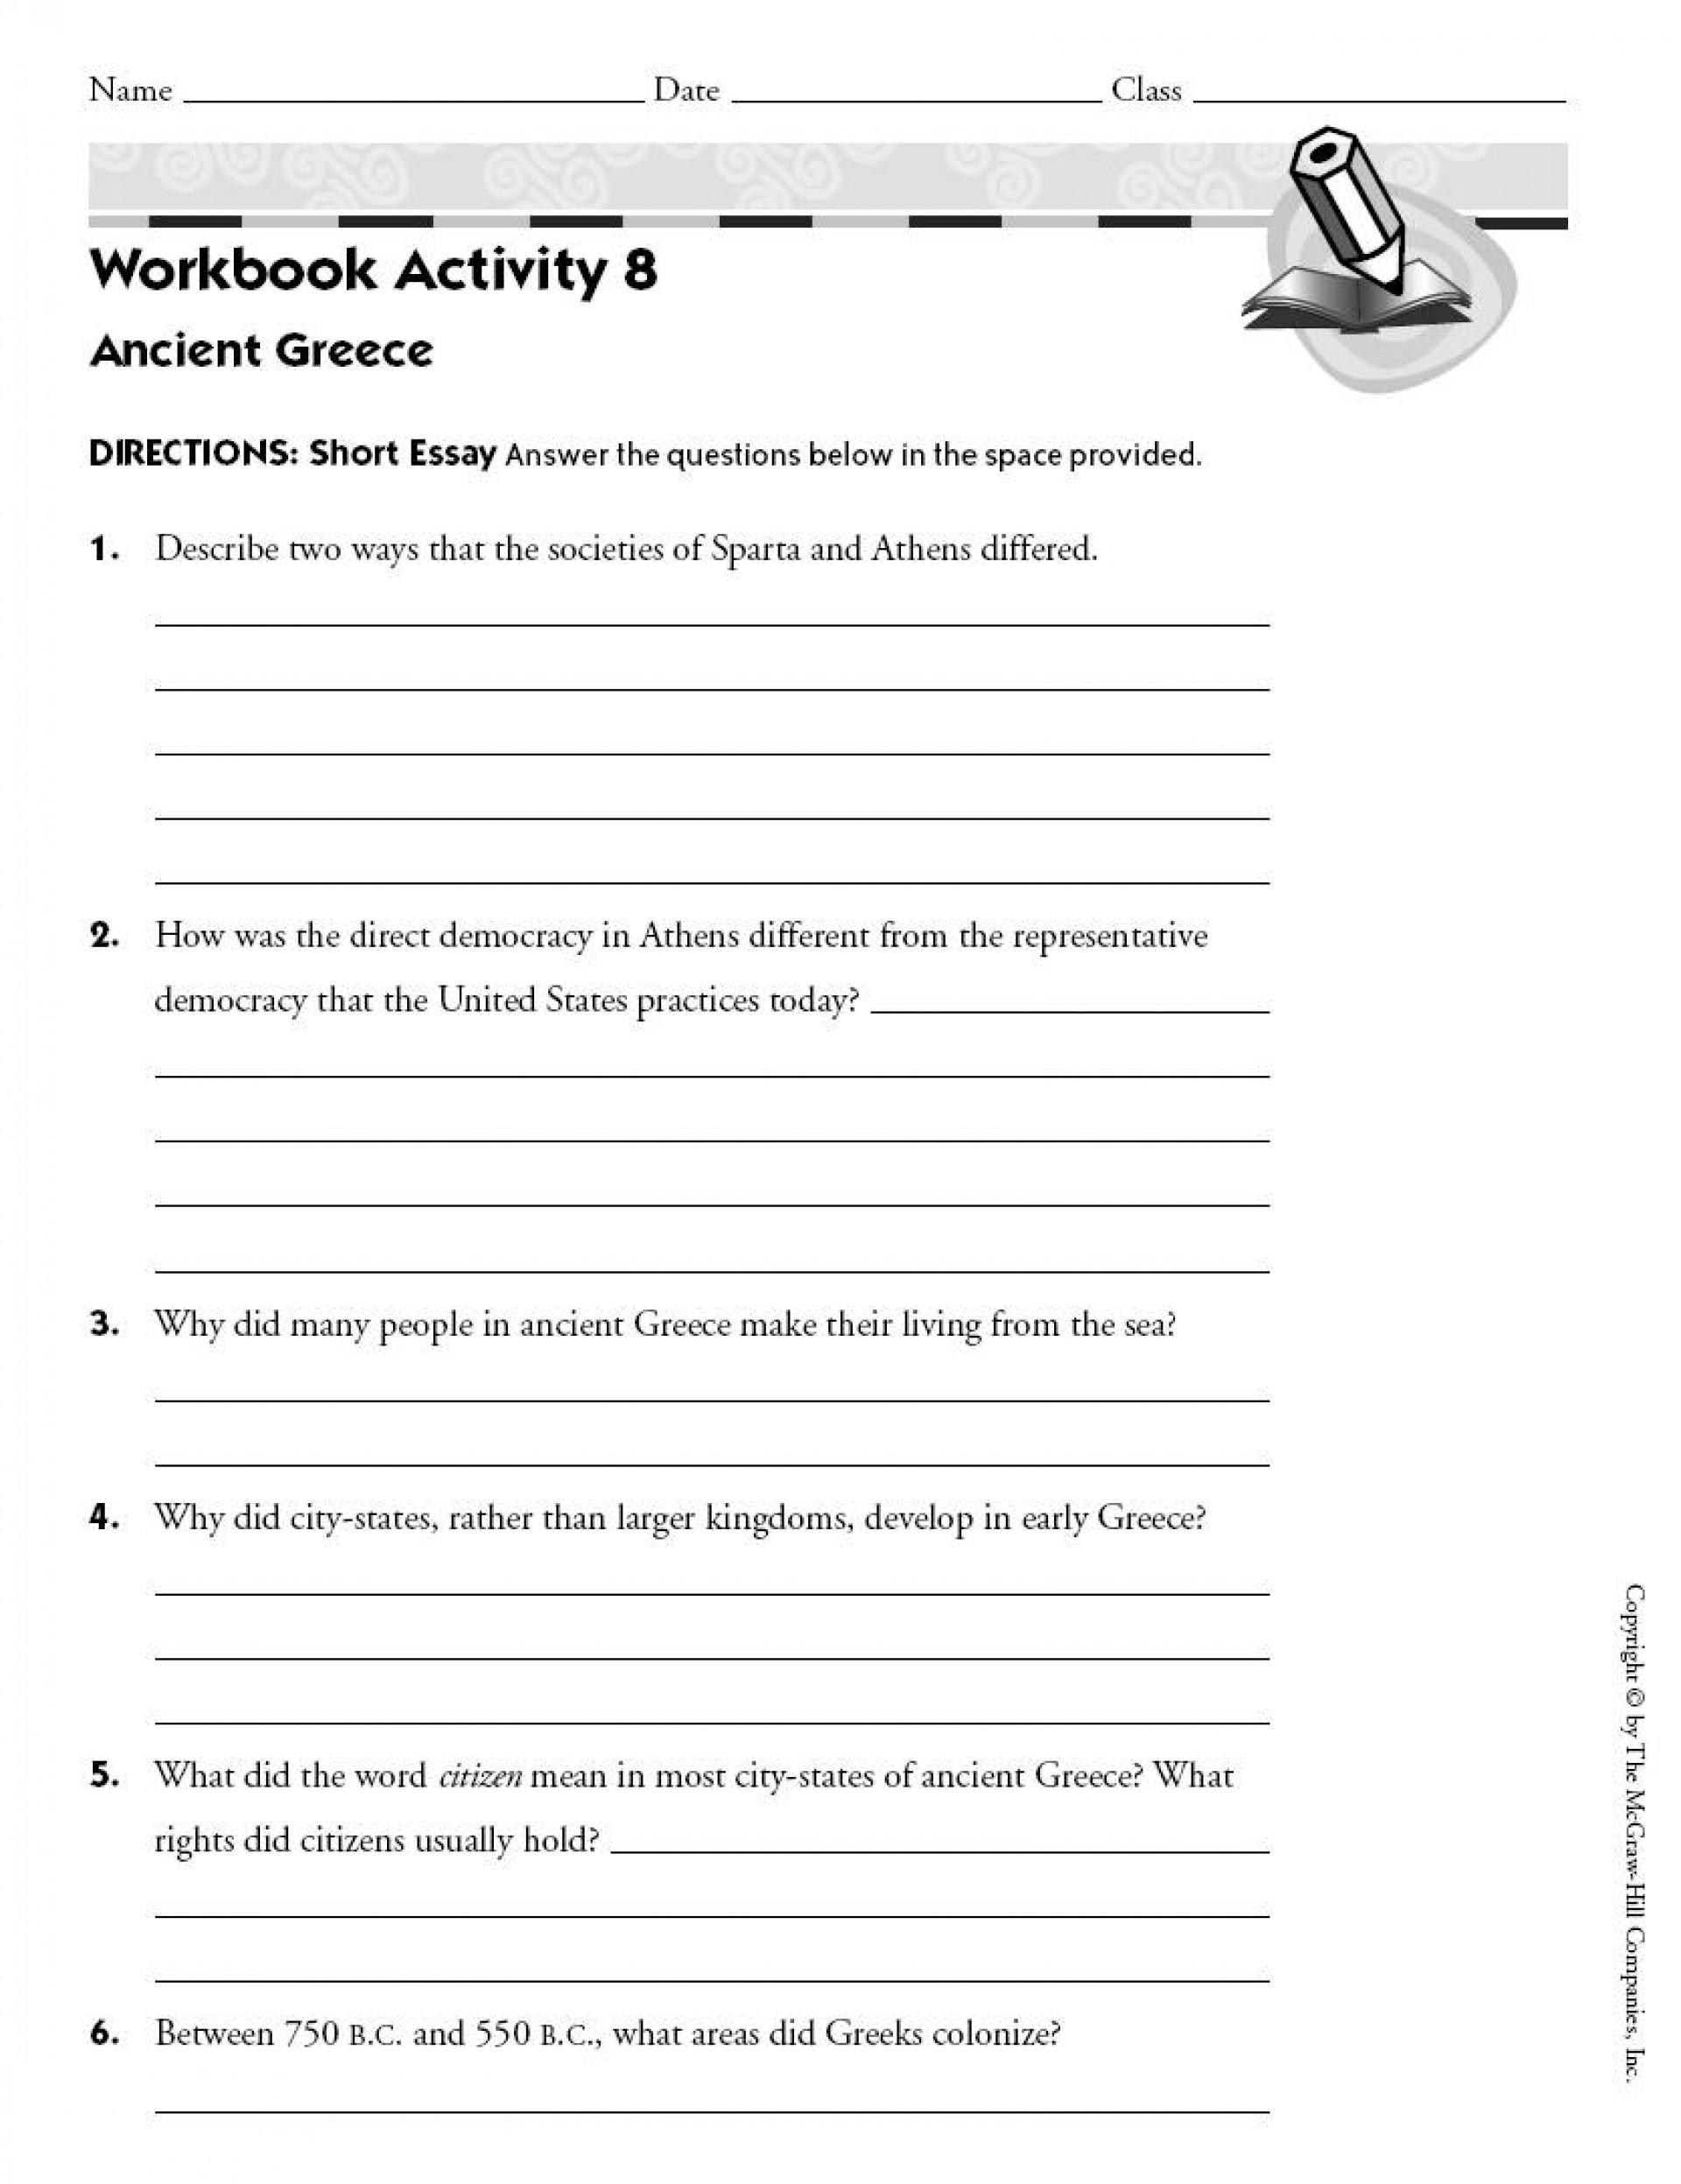 003 Essay Example Gates Millenium Scholarship Essays Ancientgreece Staggering Millennium Questions 1920